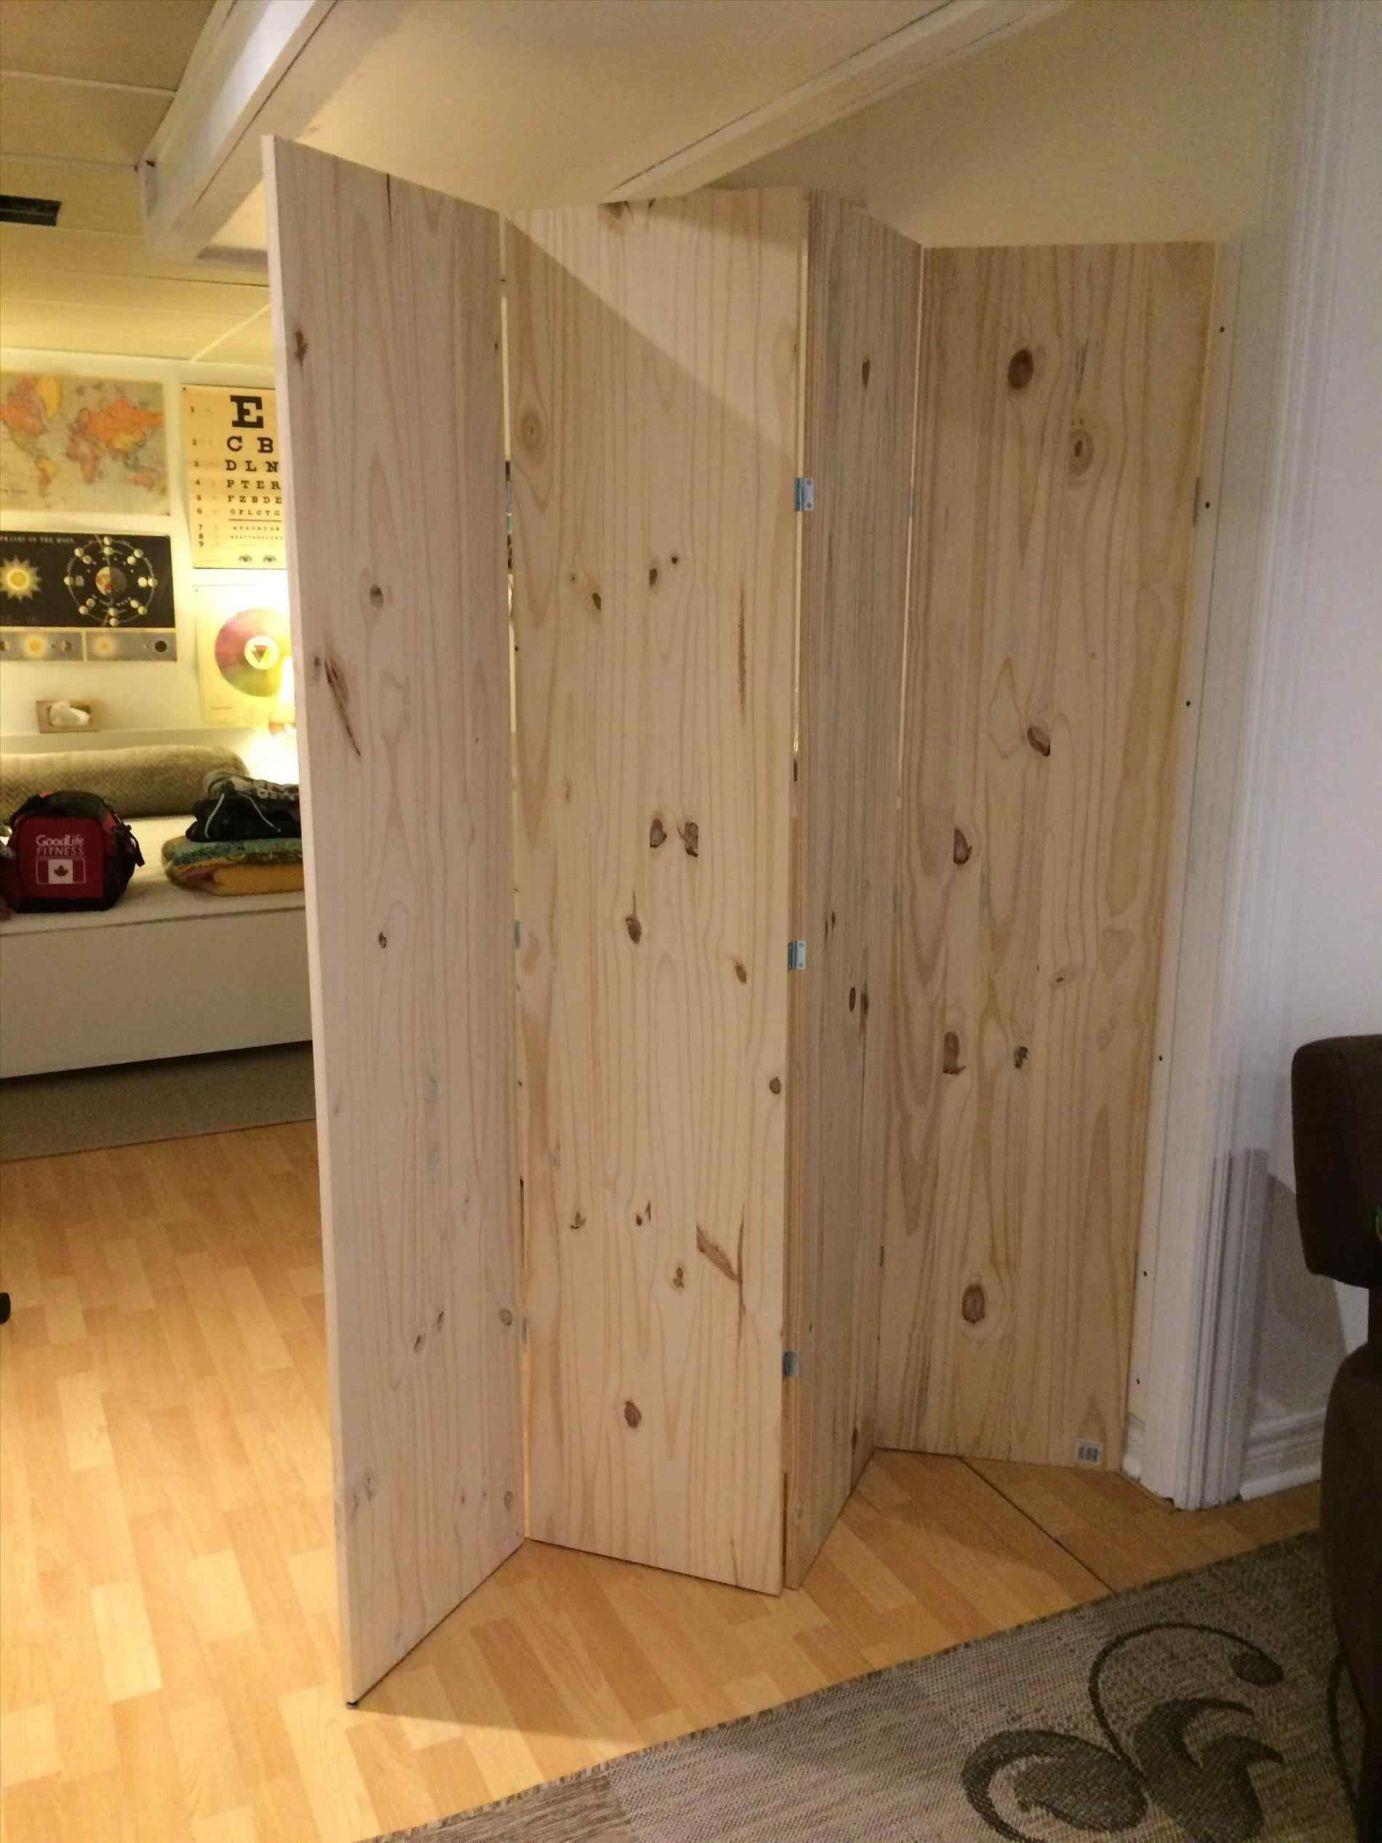 20 Unique Home Depot Room Dividers In 2020 Diy Room Divider Free Standing Wall Bedroom Diy